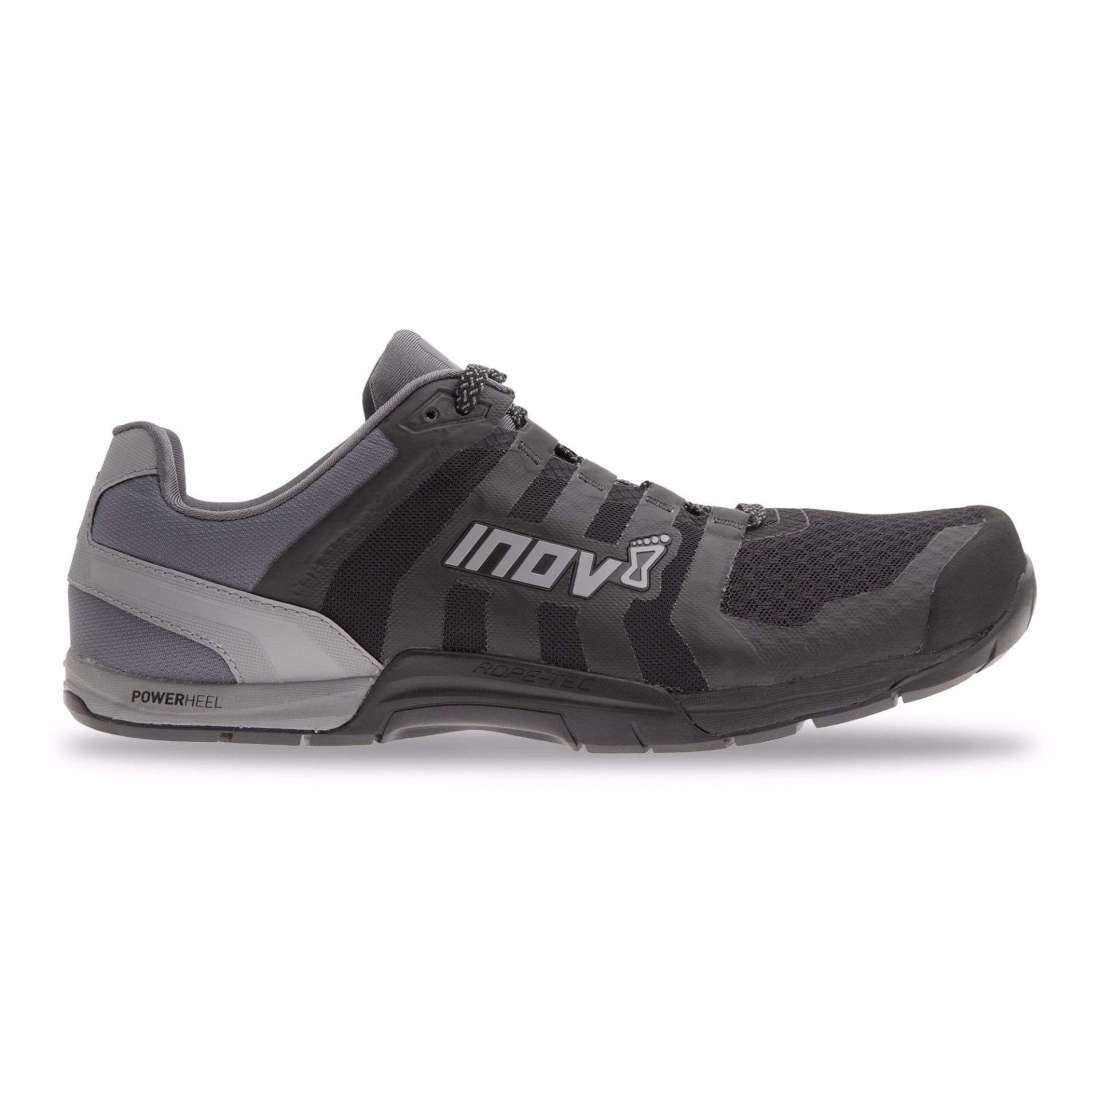 Inov-8 F-Lite 235 V2 | shoes